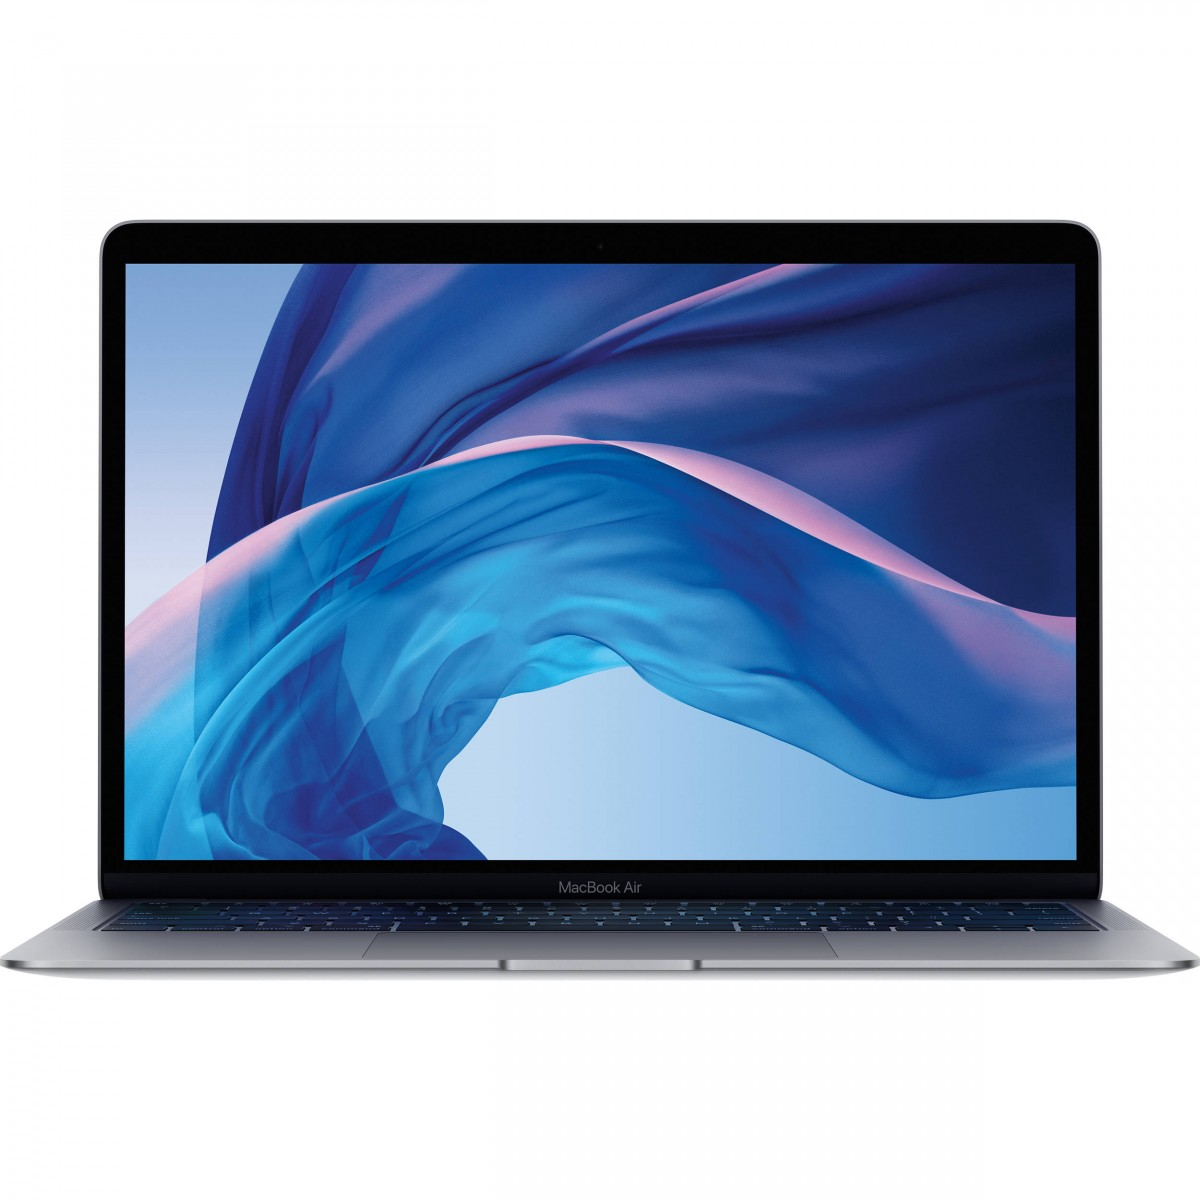 Apple MacBook Air 2018 MRE82CZ/A